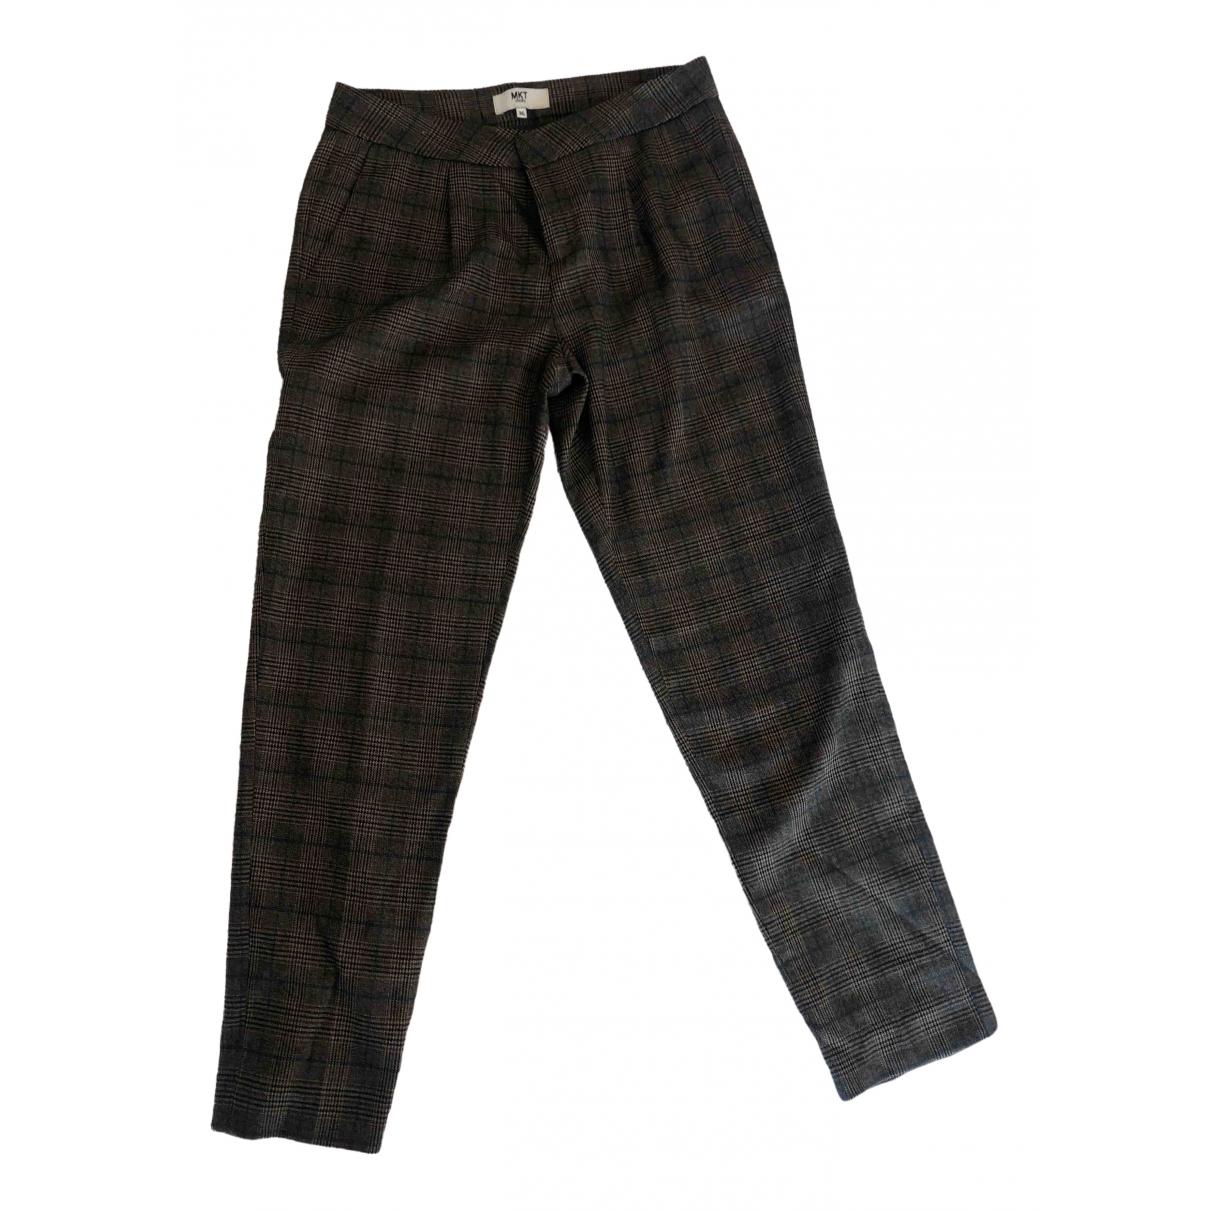 Mkt Studio \N Grey Trousers for Women 36 FR